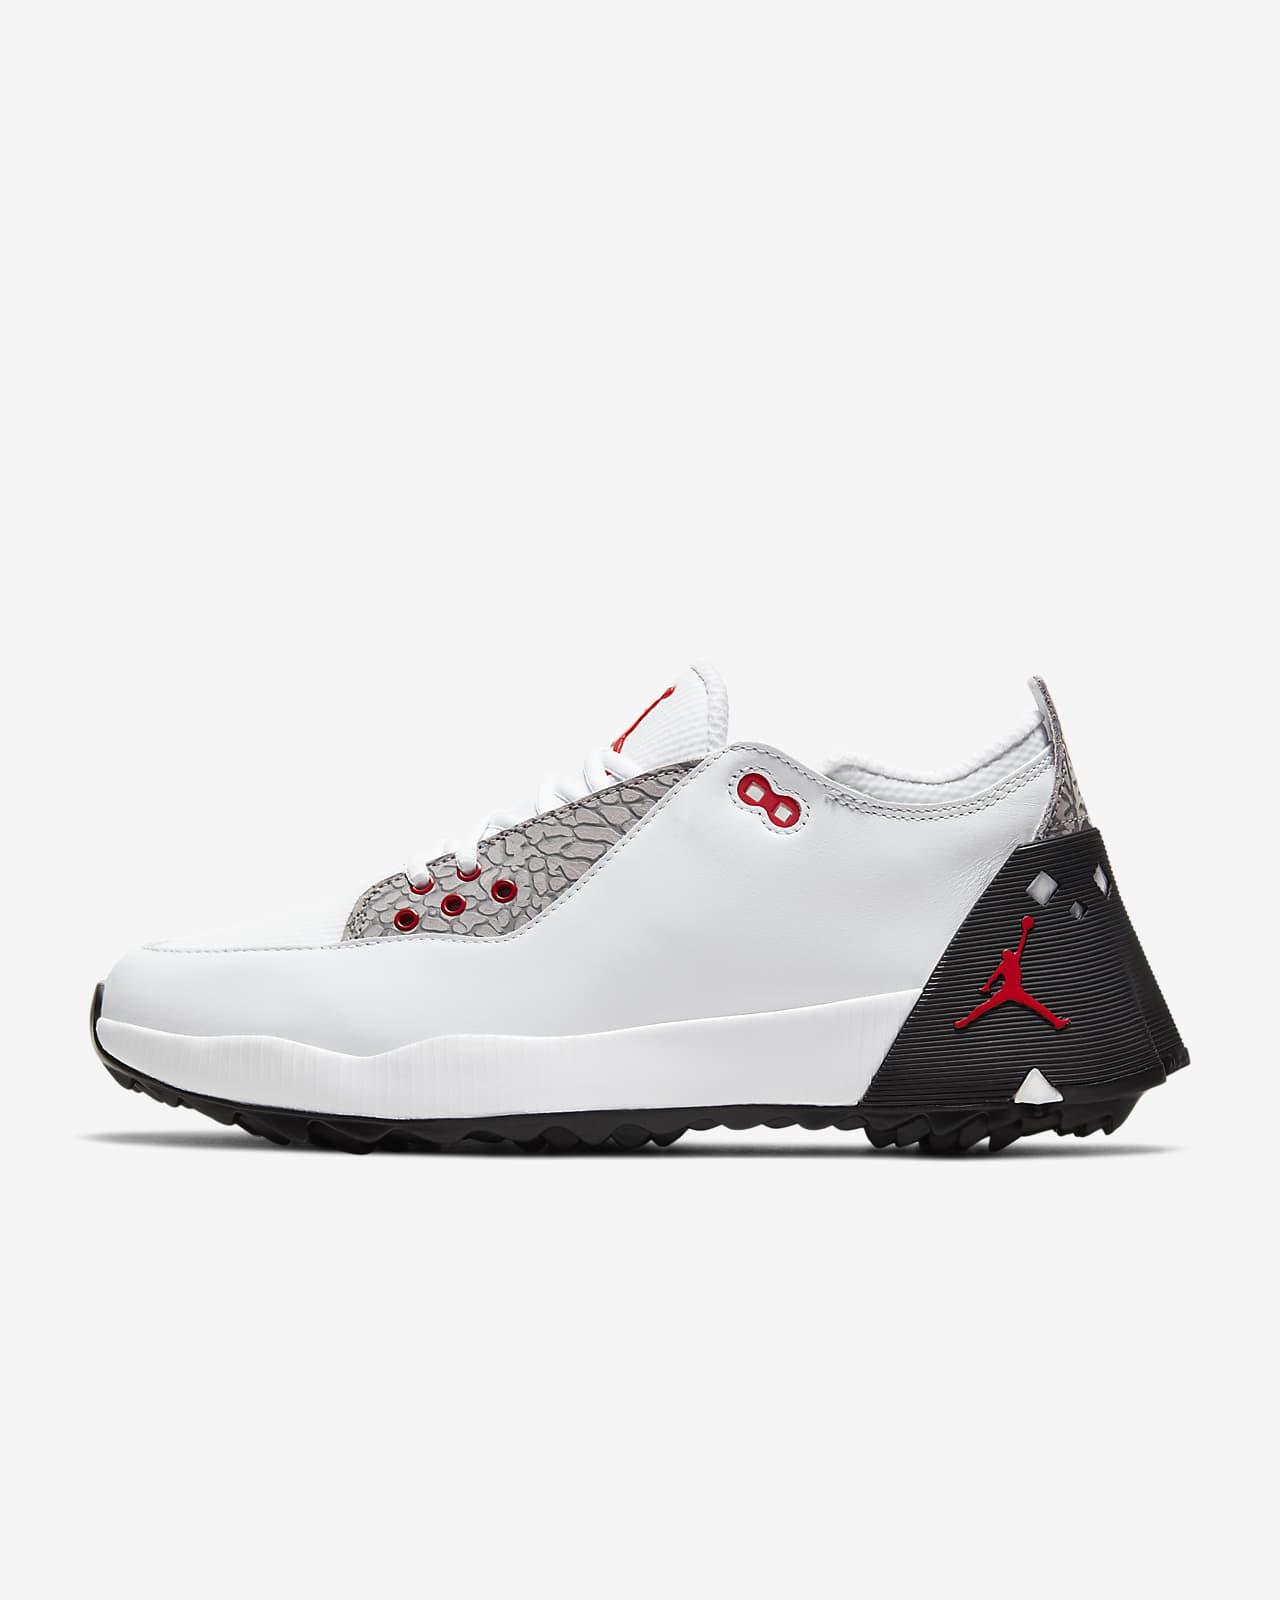 nike jordan st golf shoes